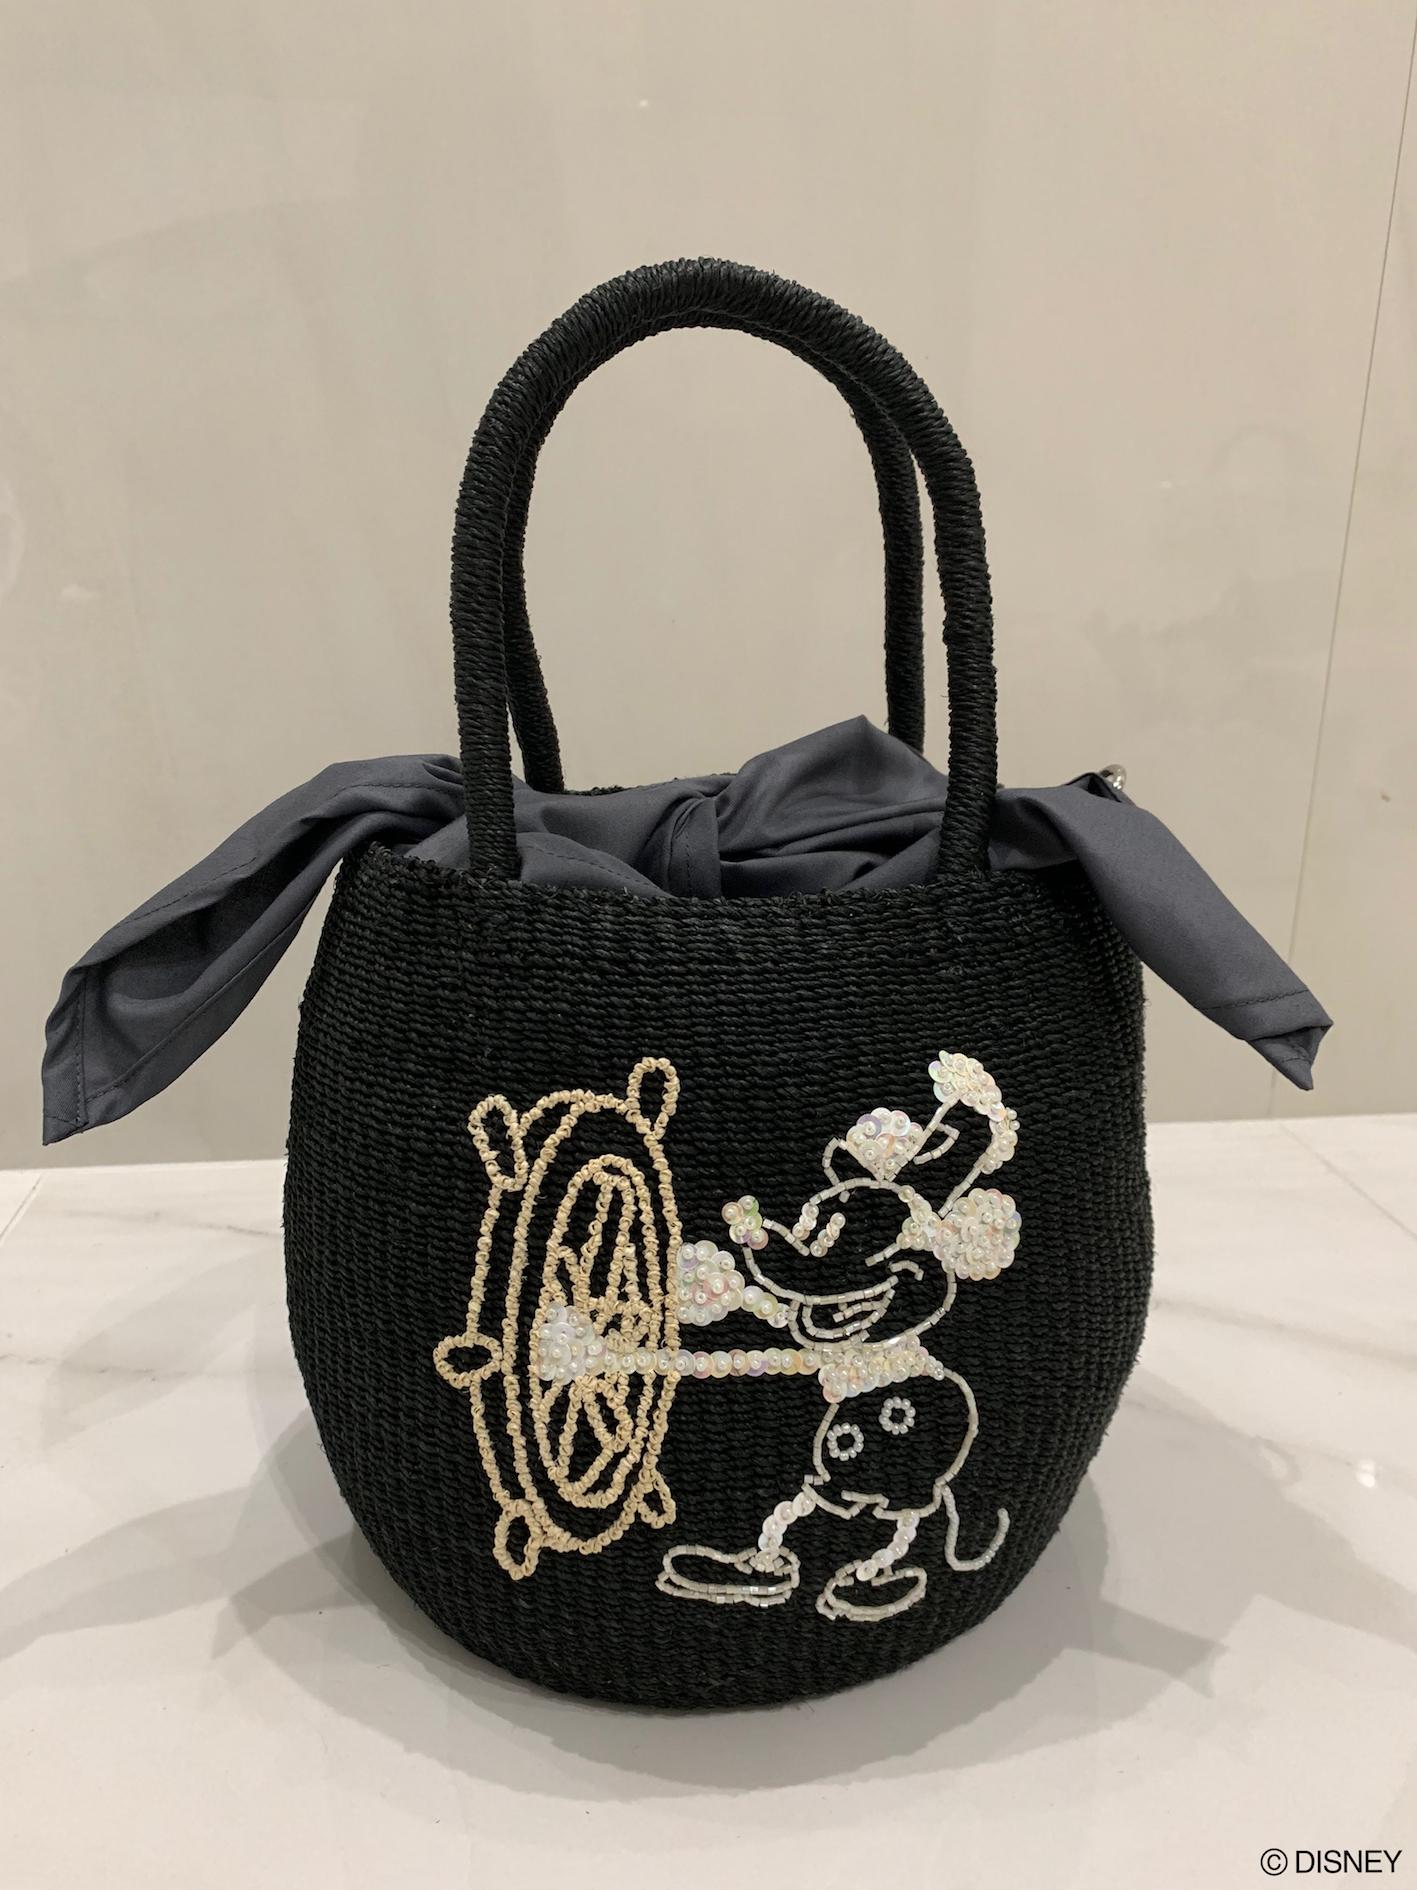 【selva secreta】Disney Mickey Mouse basket bag(black)